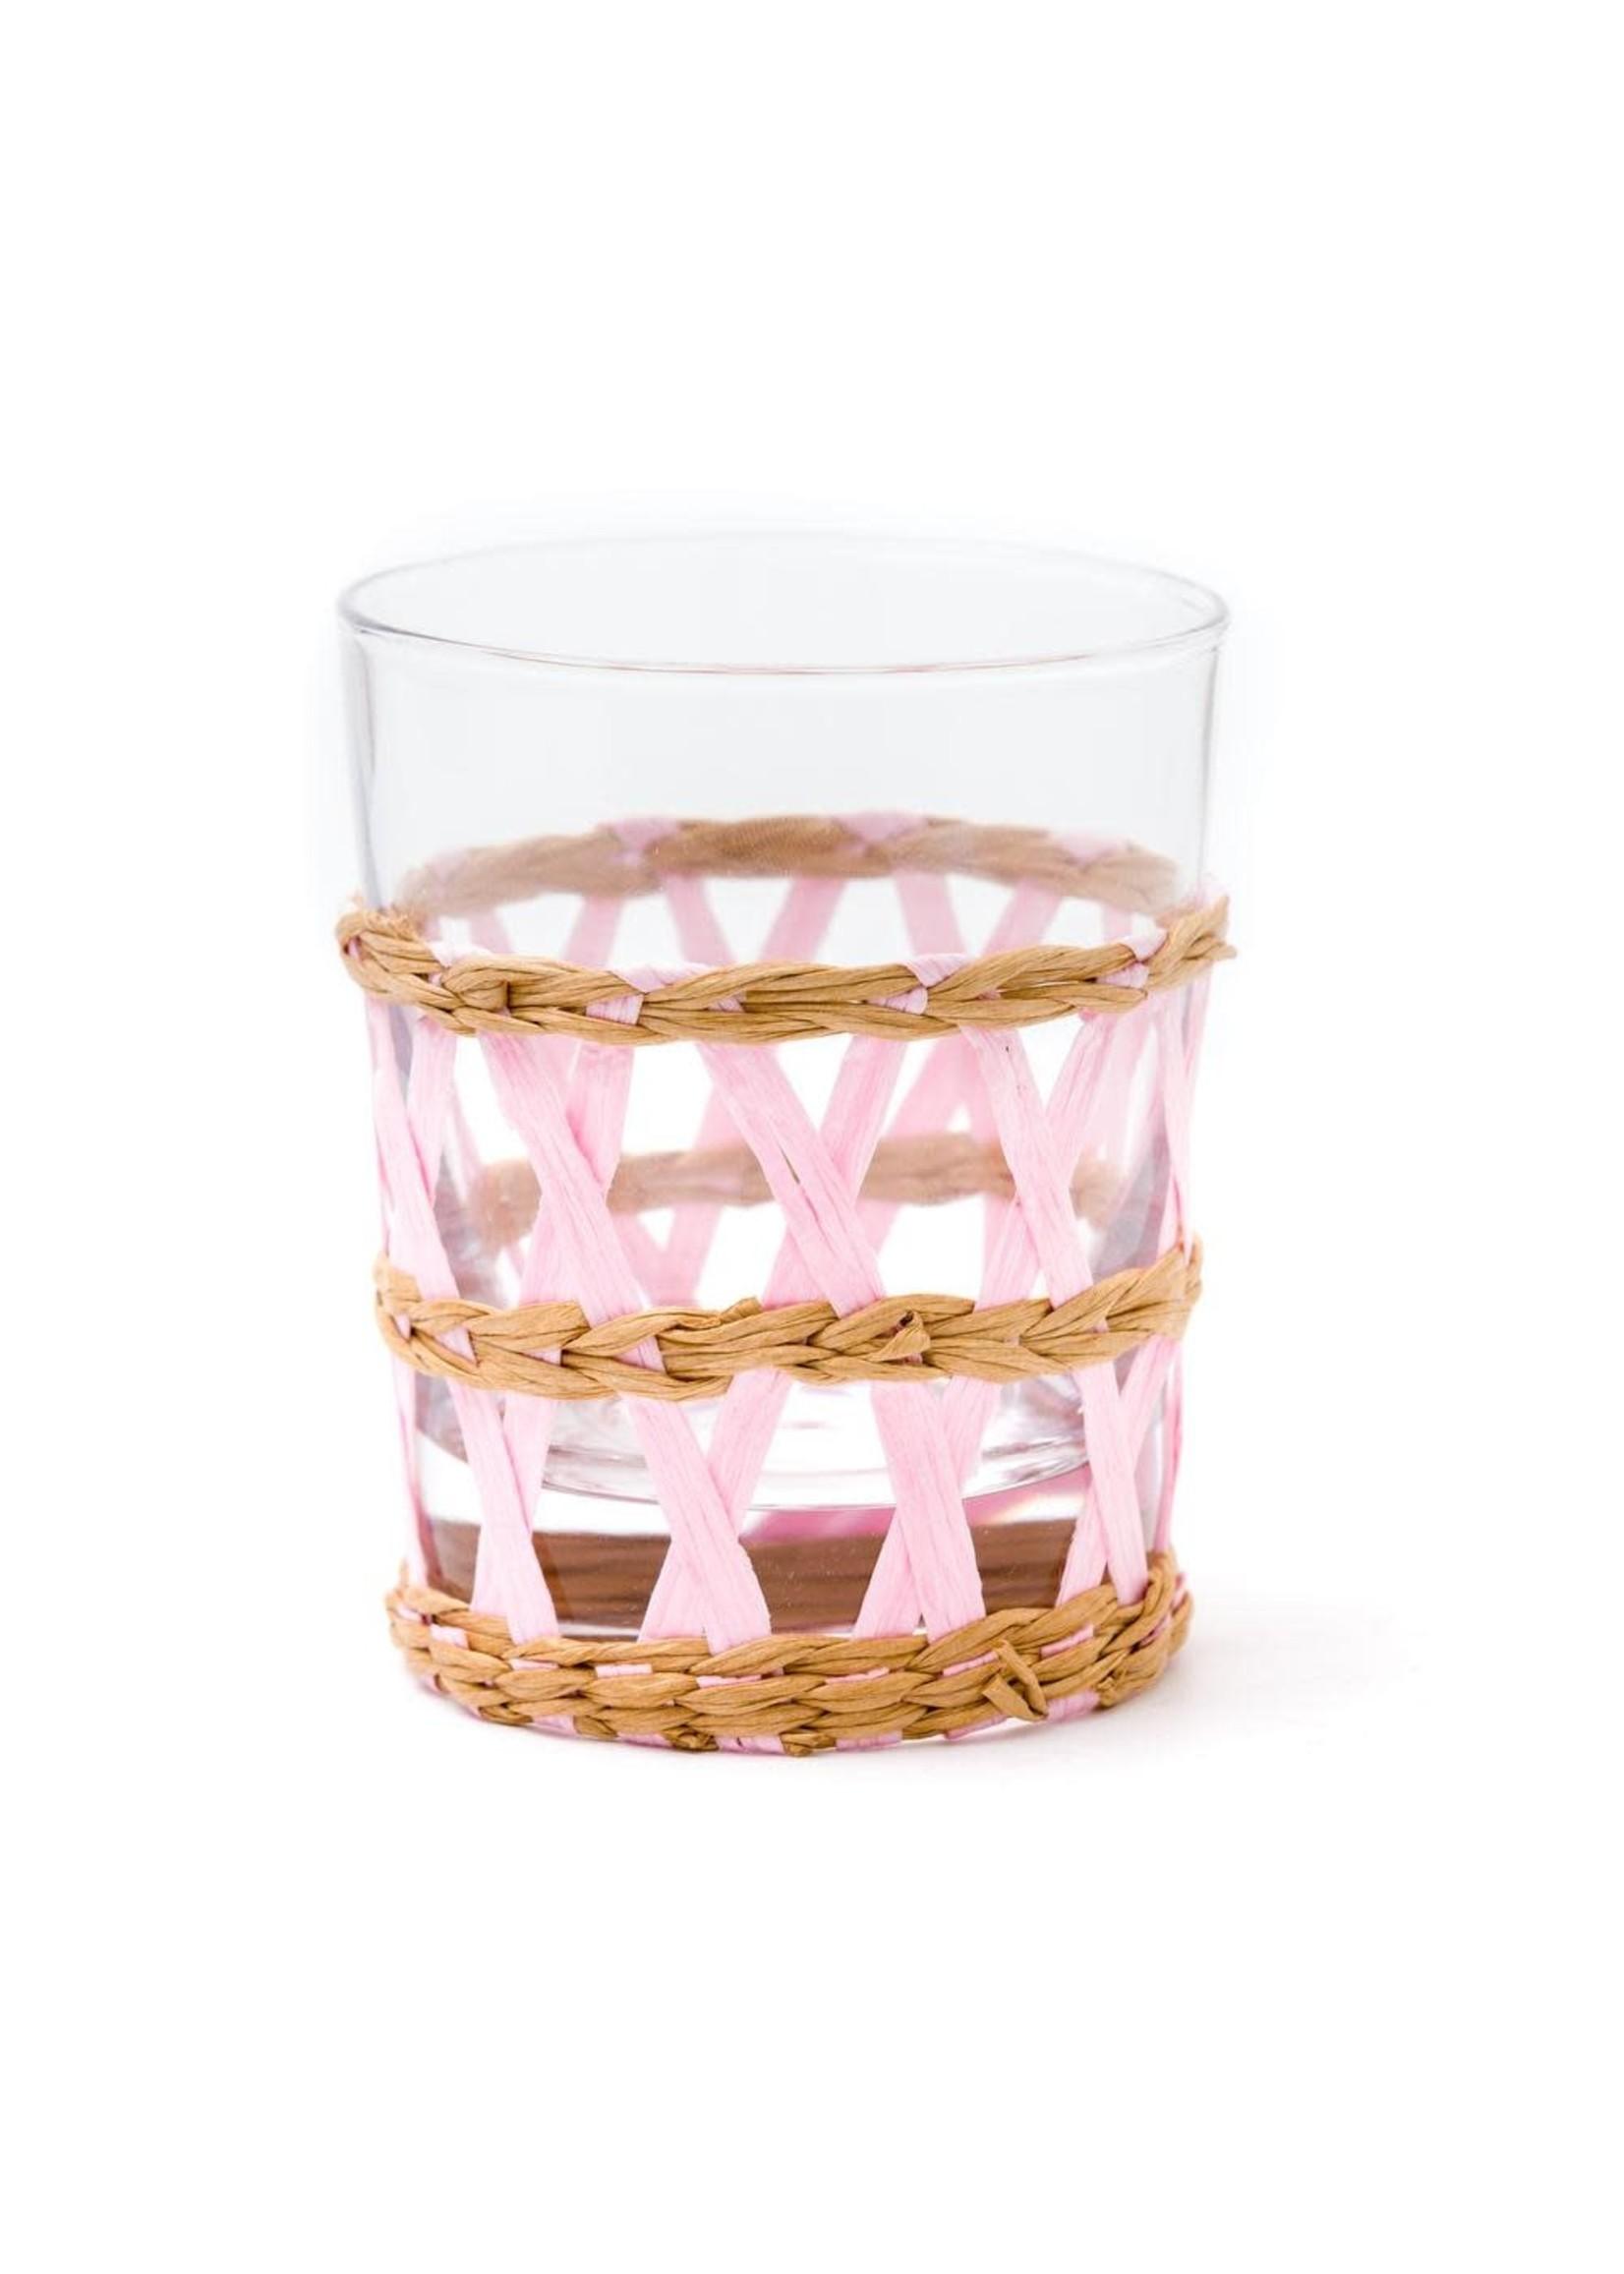 Amanda Lindroth Island Wrapped Tumbler Glass - Pink